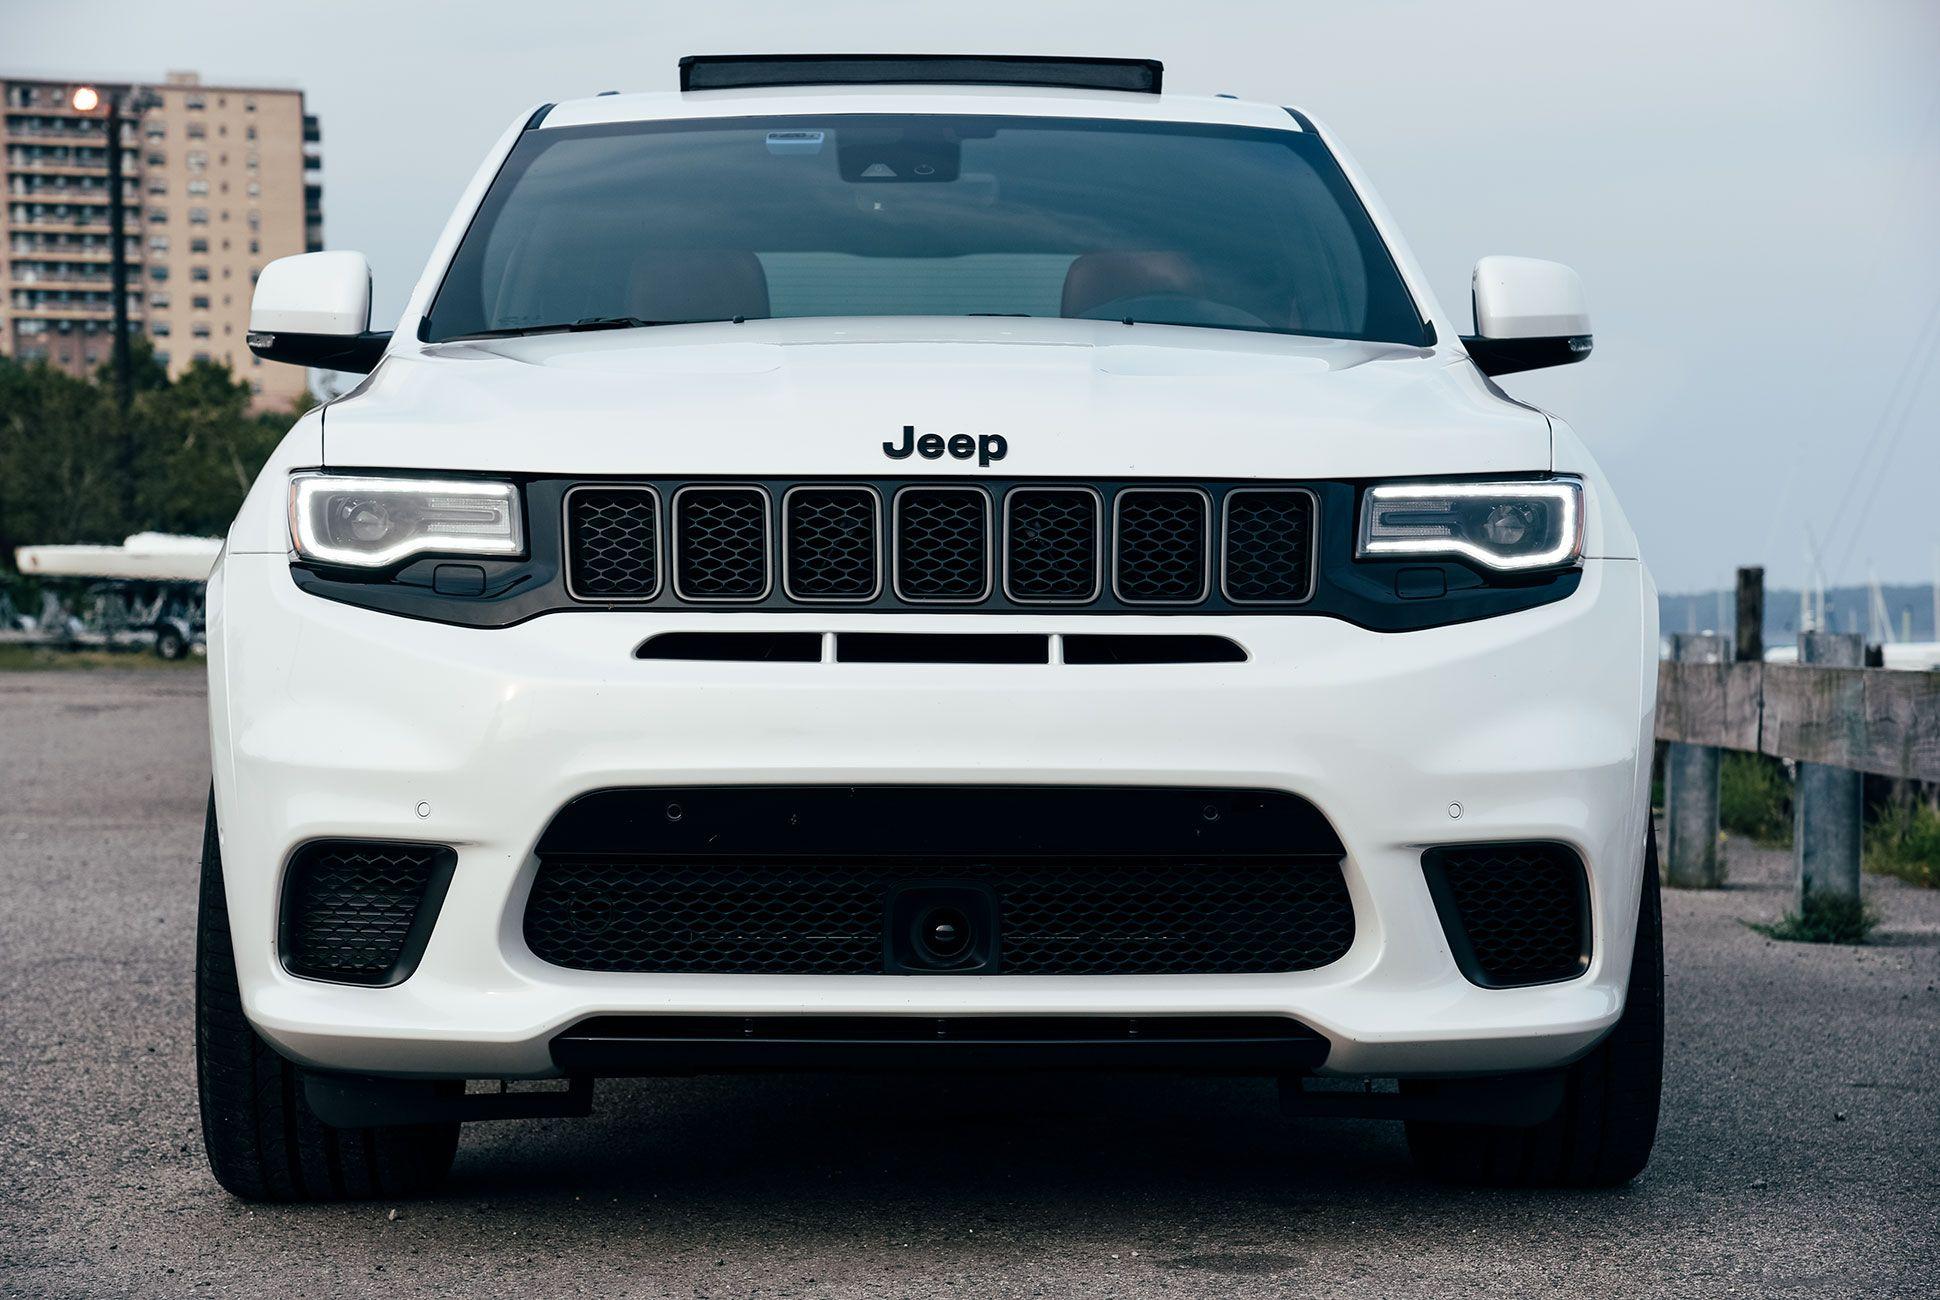 Jeep-Trailhawk-gear-patrol-slide-5